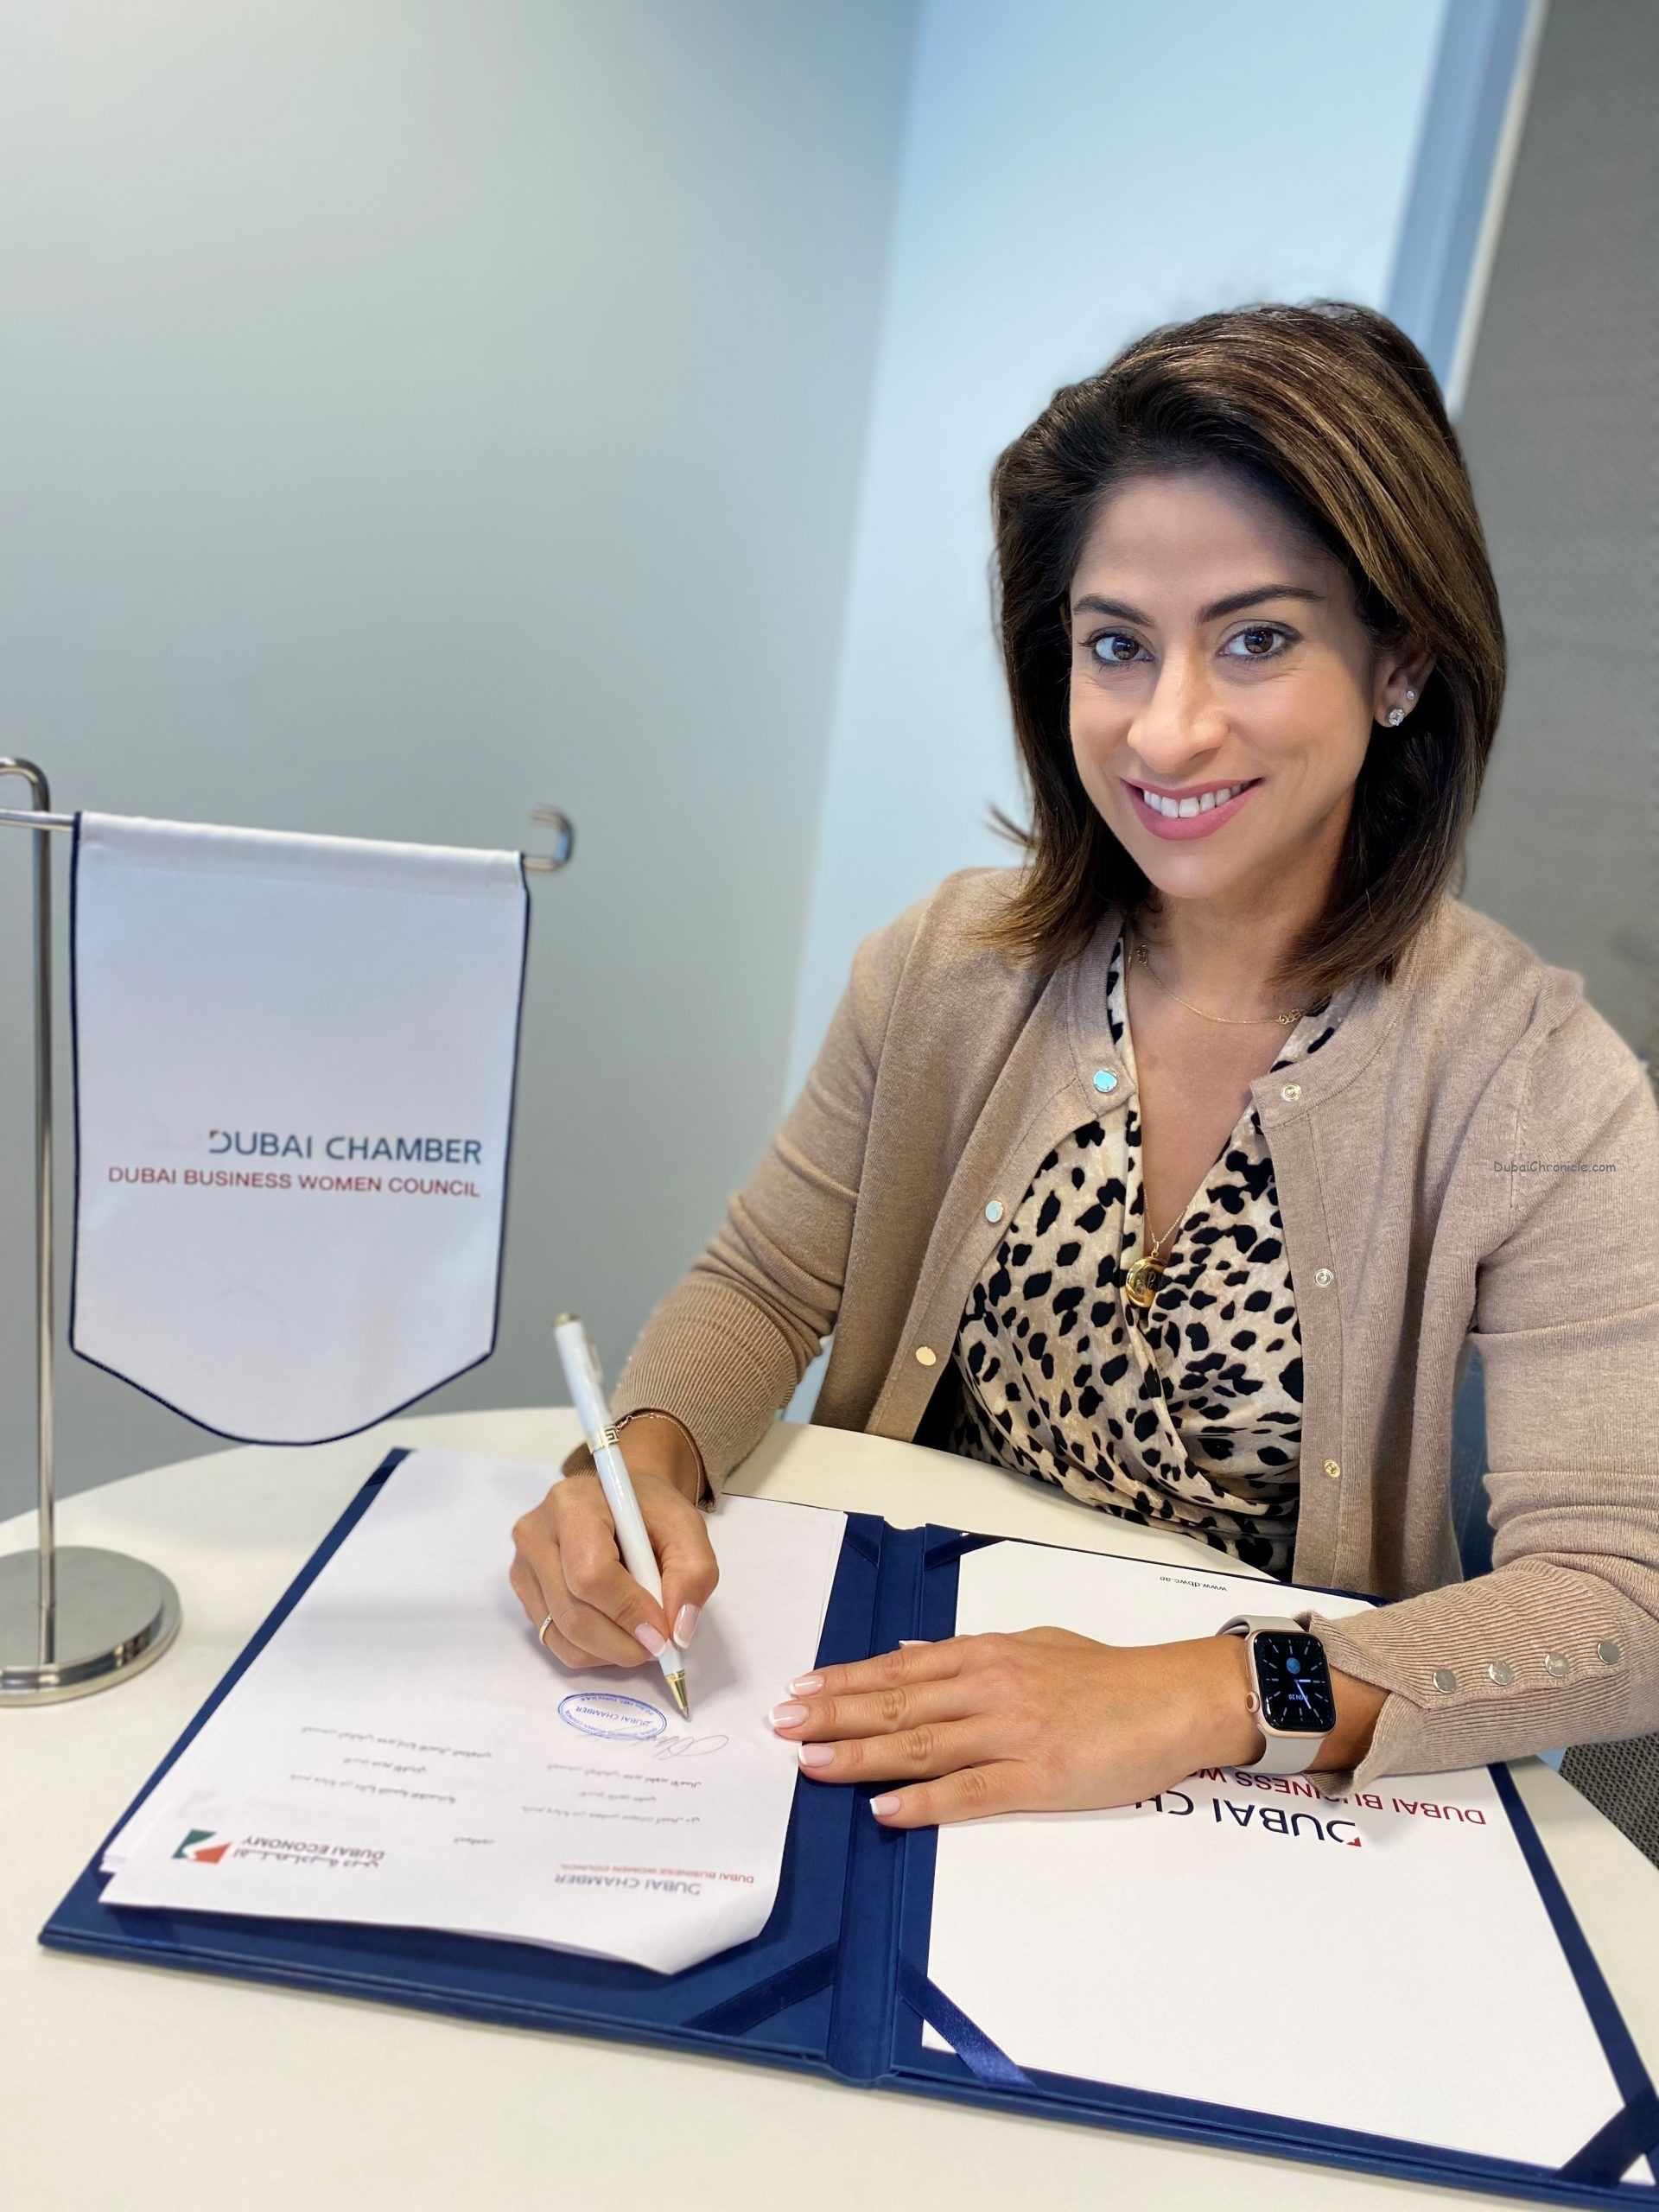 dbwc women ded entrepreneurs collaborate